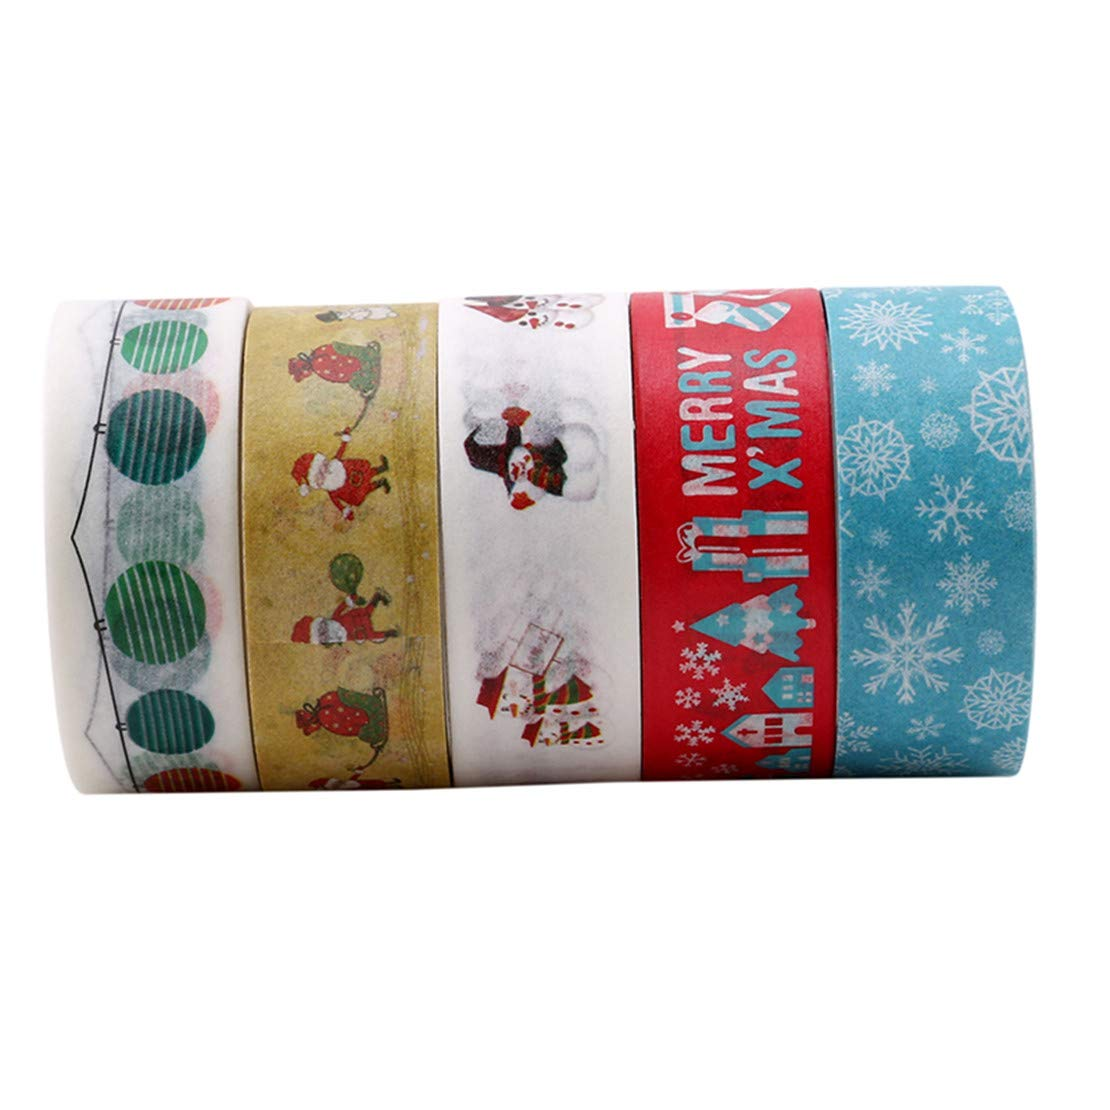 pack Christmas Decorative Washi Tape DIY Adhesive Scrapbooking Stickers(Style 5 Winwinfly 10Pcs